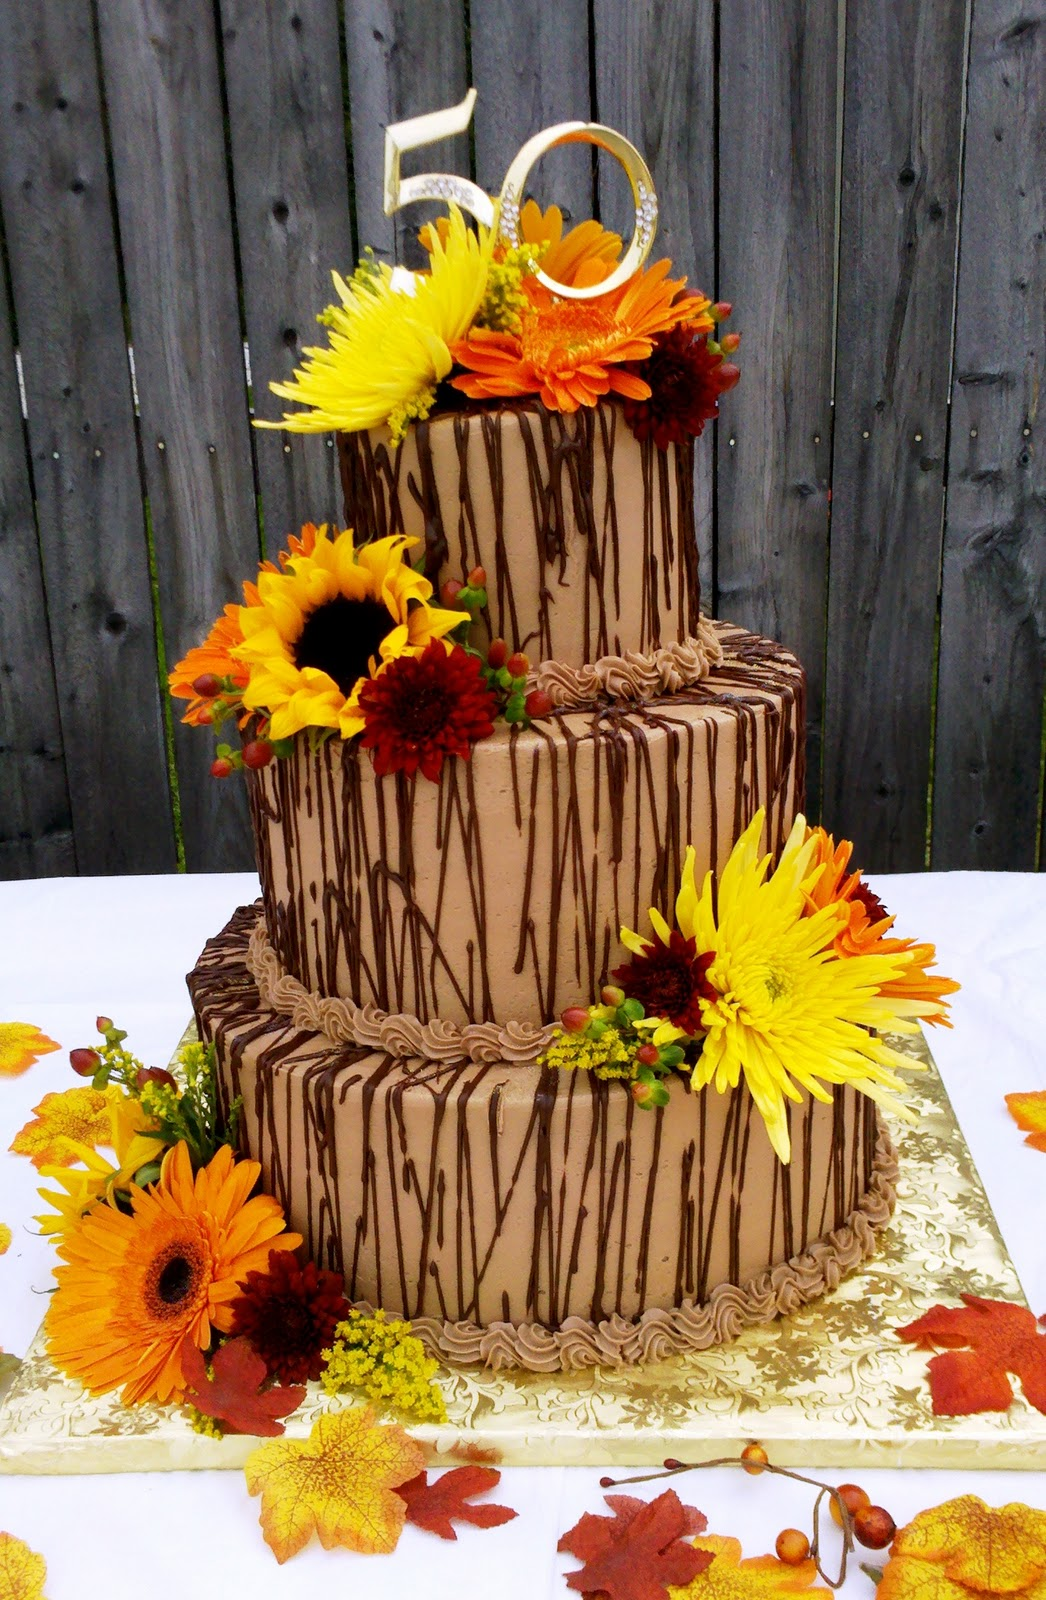 Leslie S Cake Blog From Stan S Northfield Bakery Fall